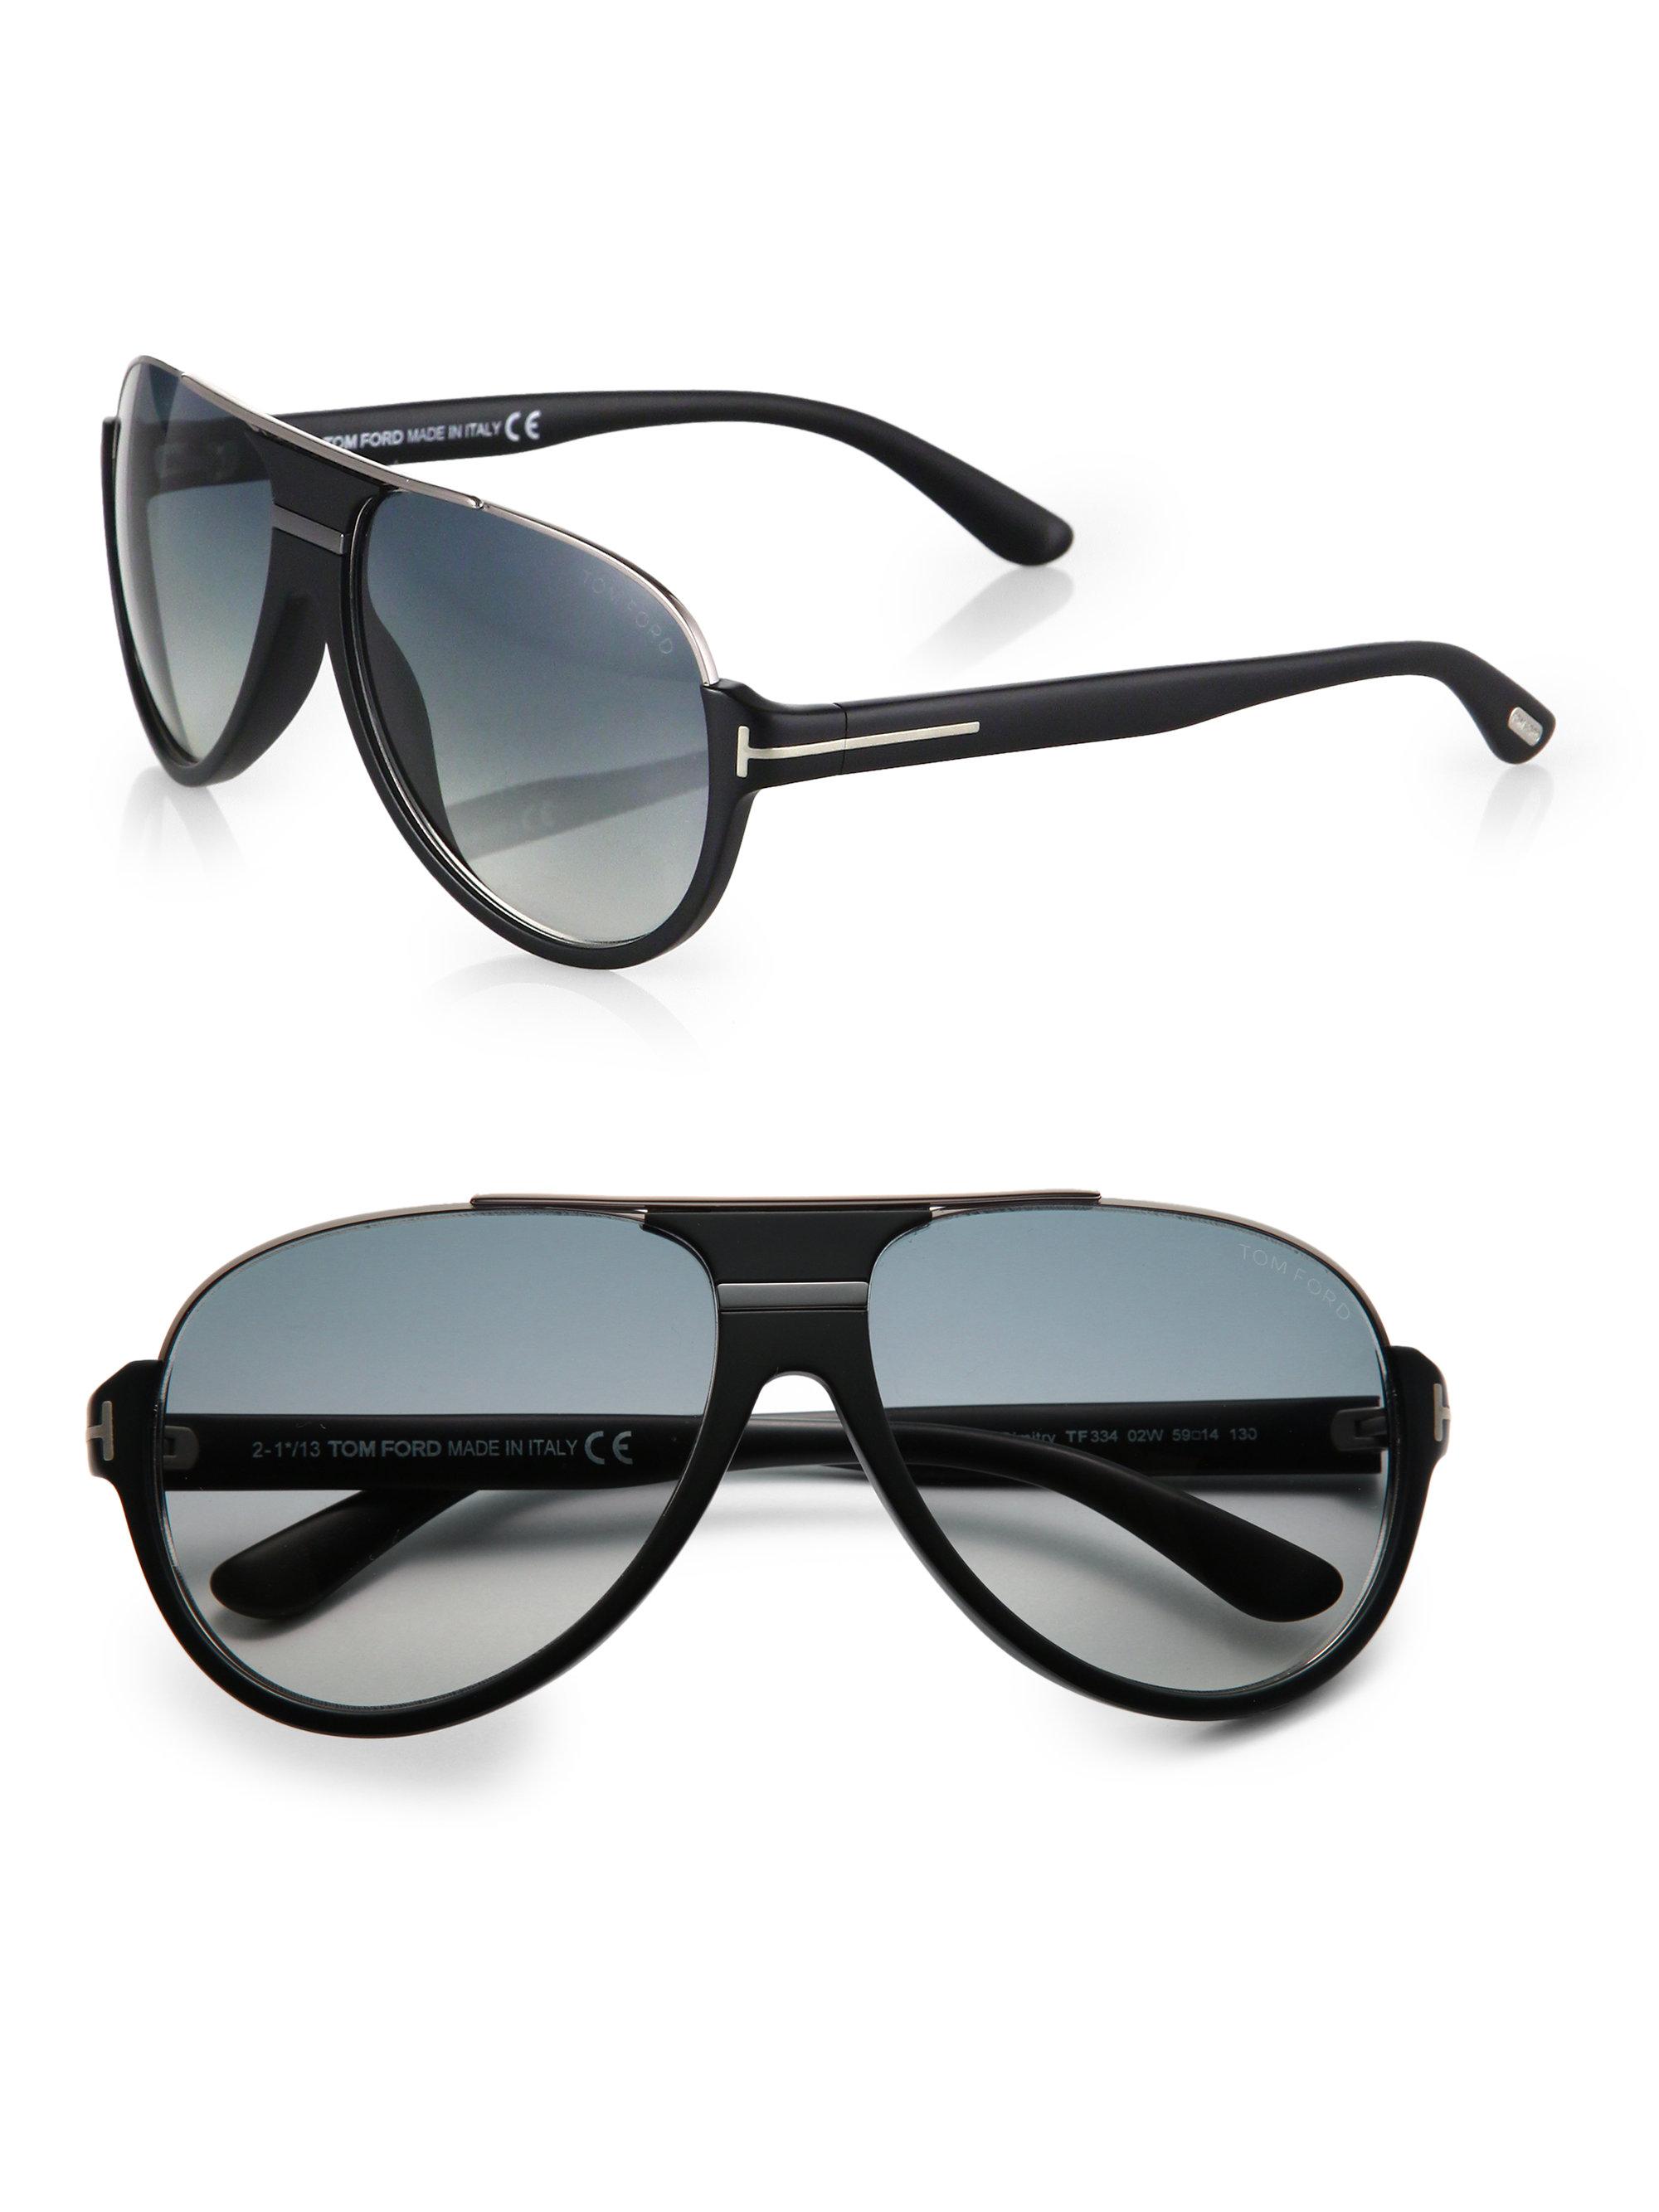 72647648fc Tom ford dimitry sunglasses celebrity